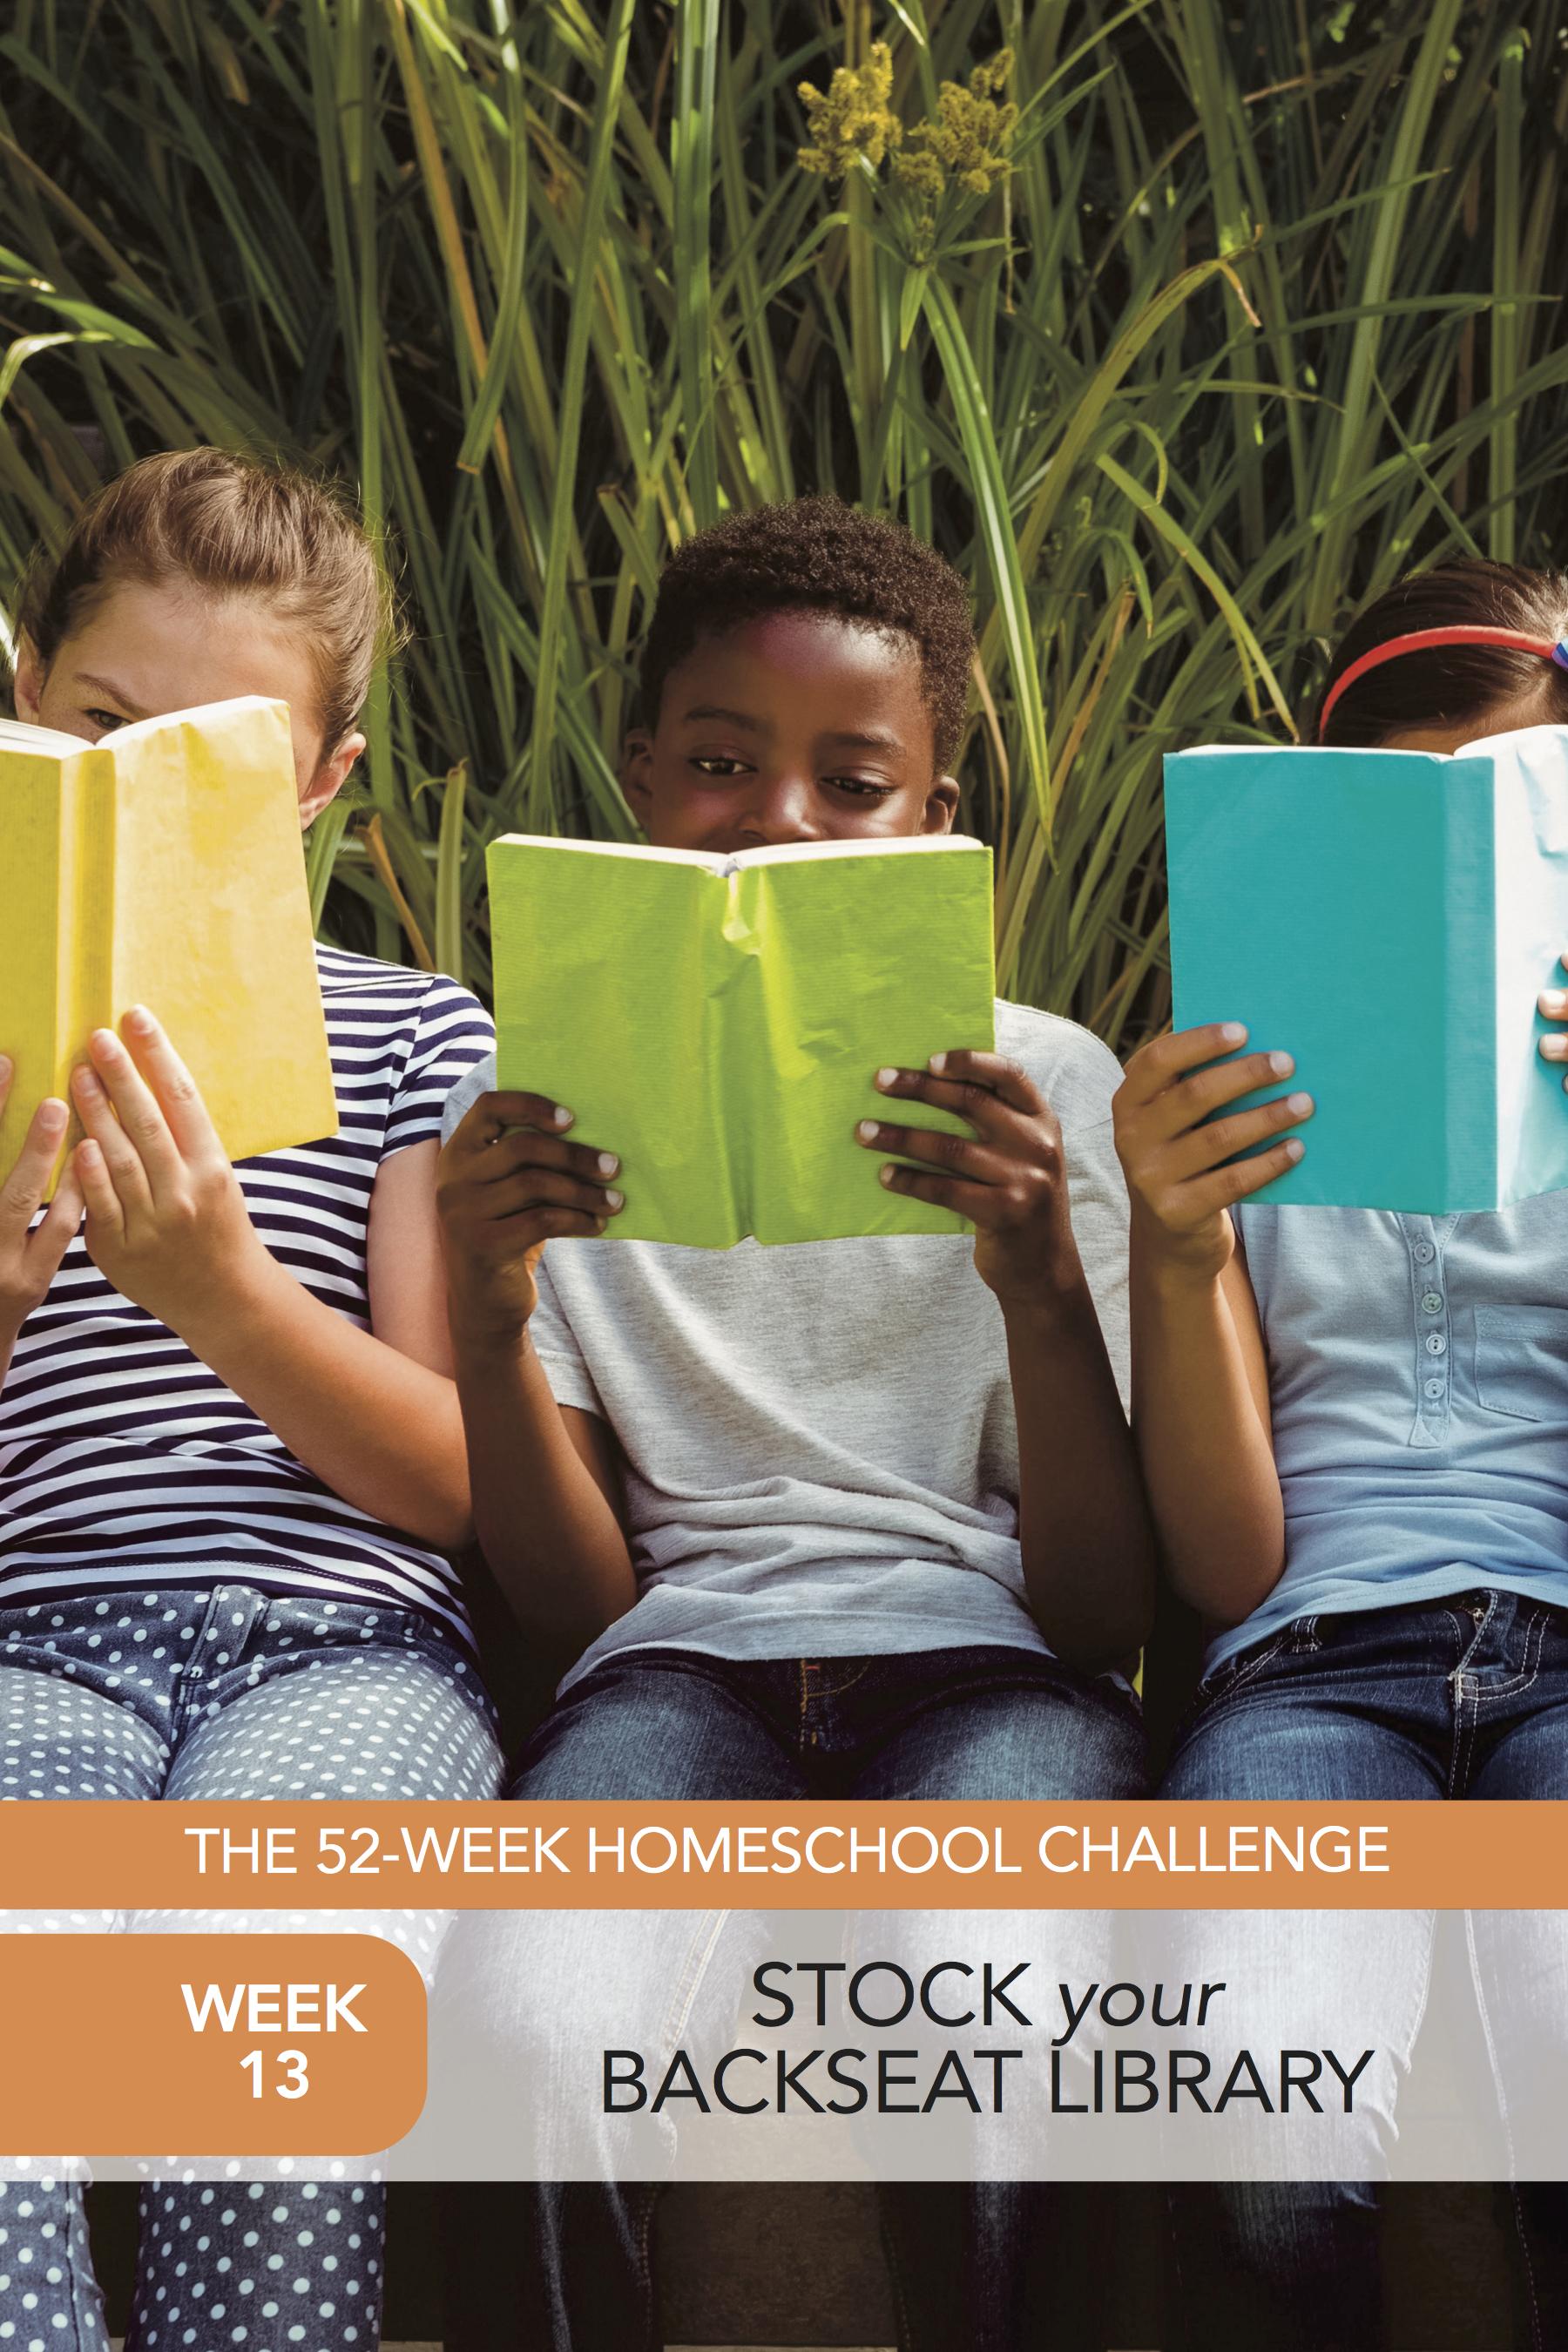 52 Weeks of Happier Homeschooling Week 13: Stock Your Backseat Library